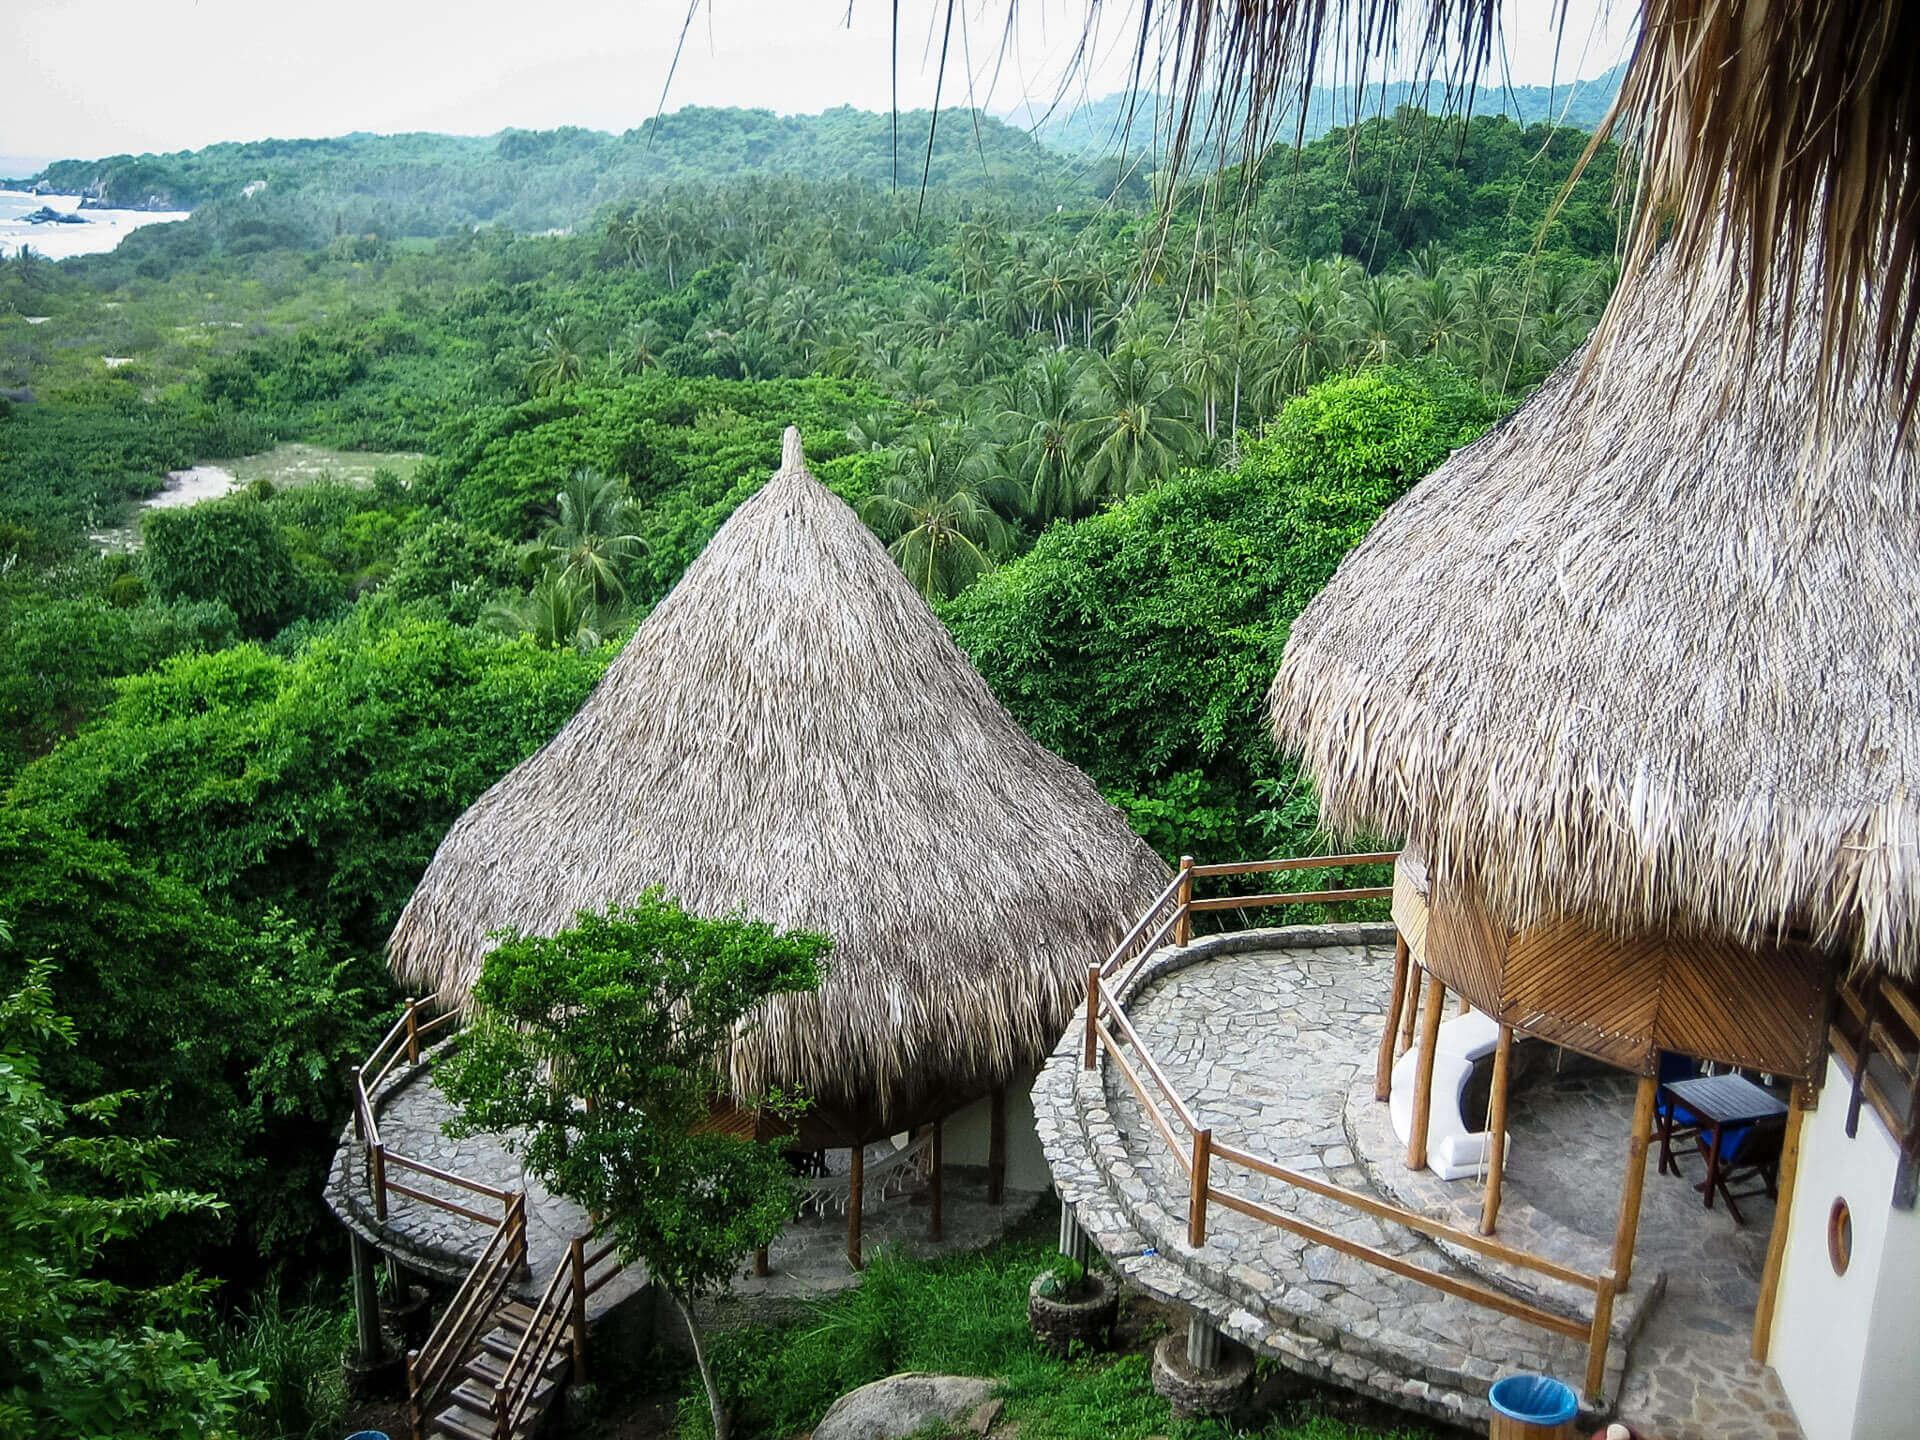 The jungle of Parque Tayrona